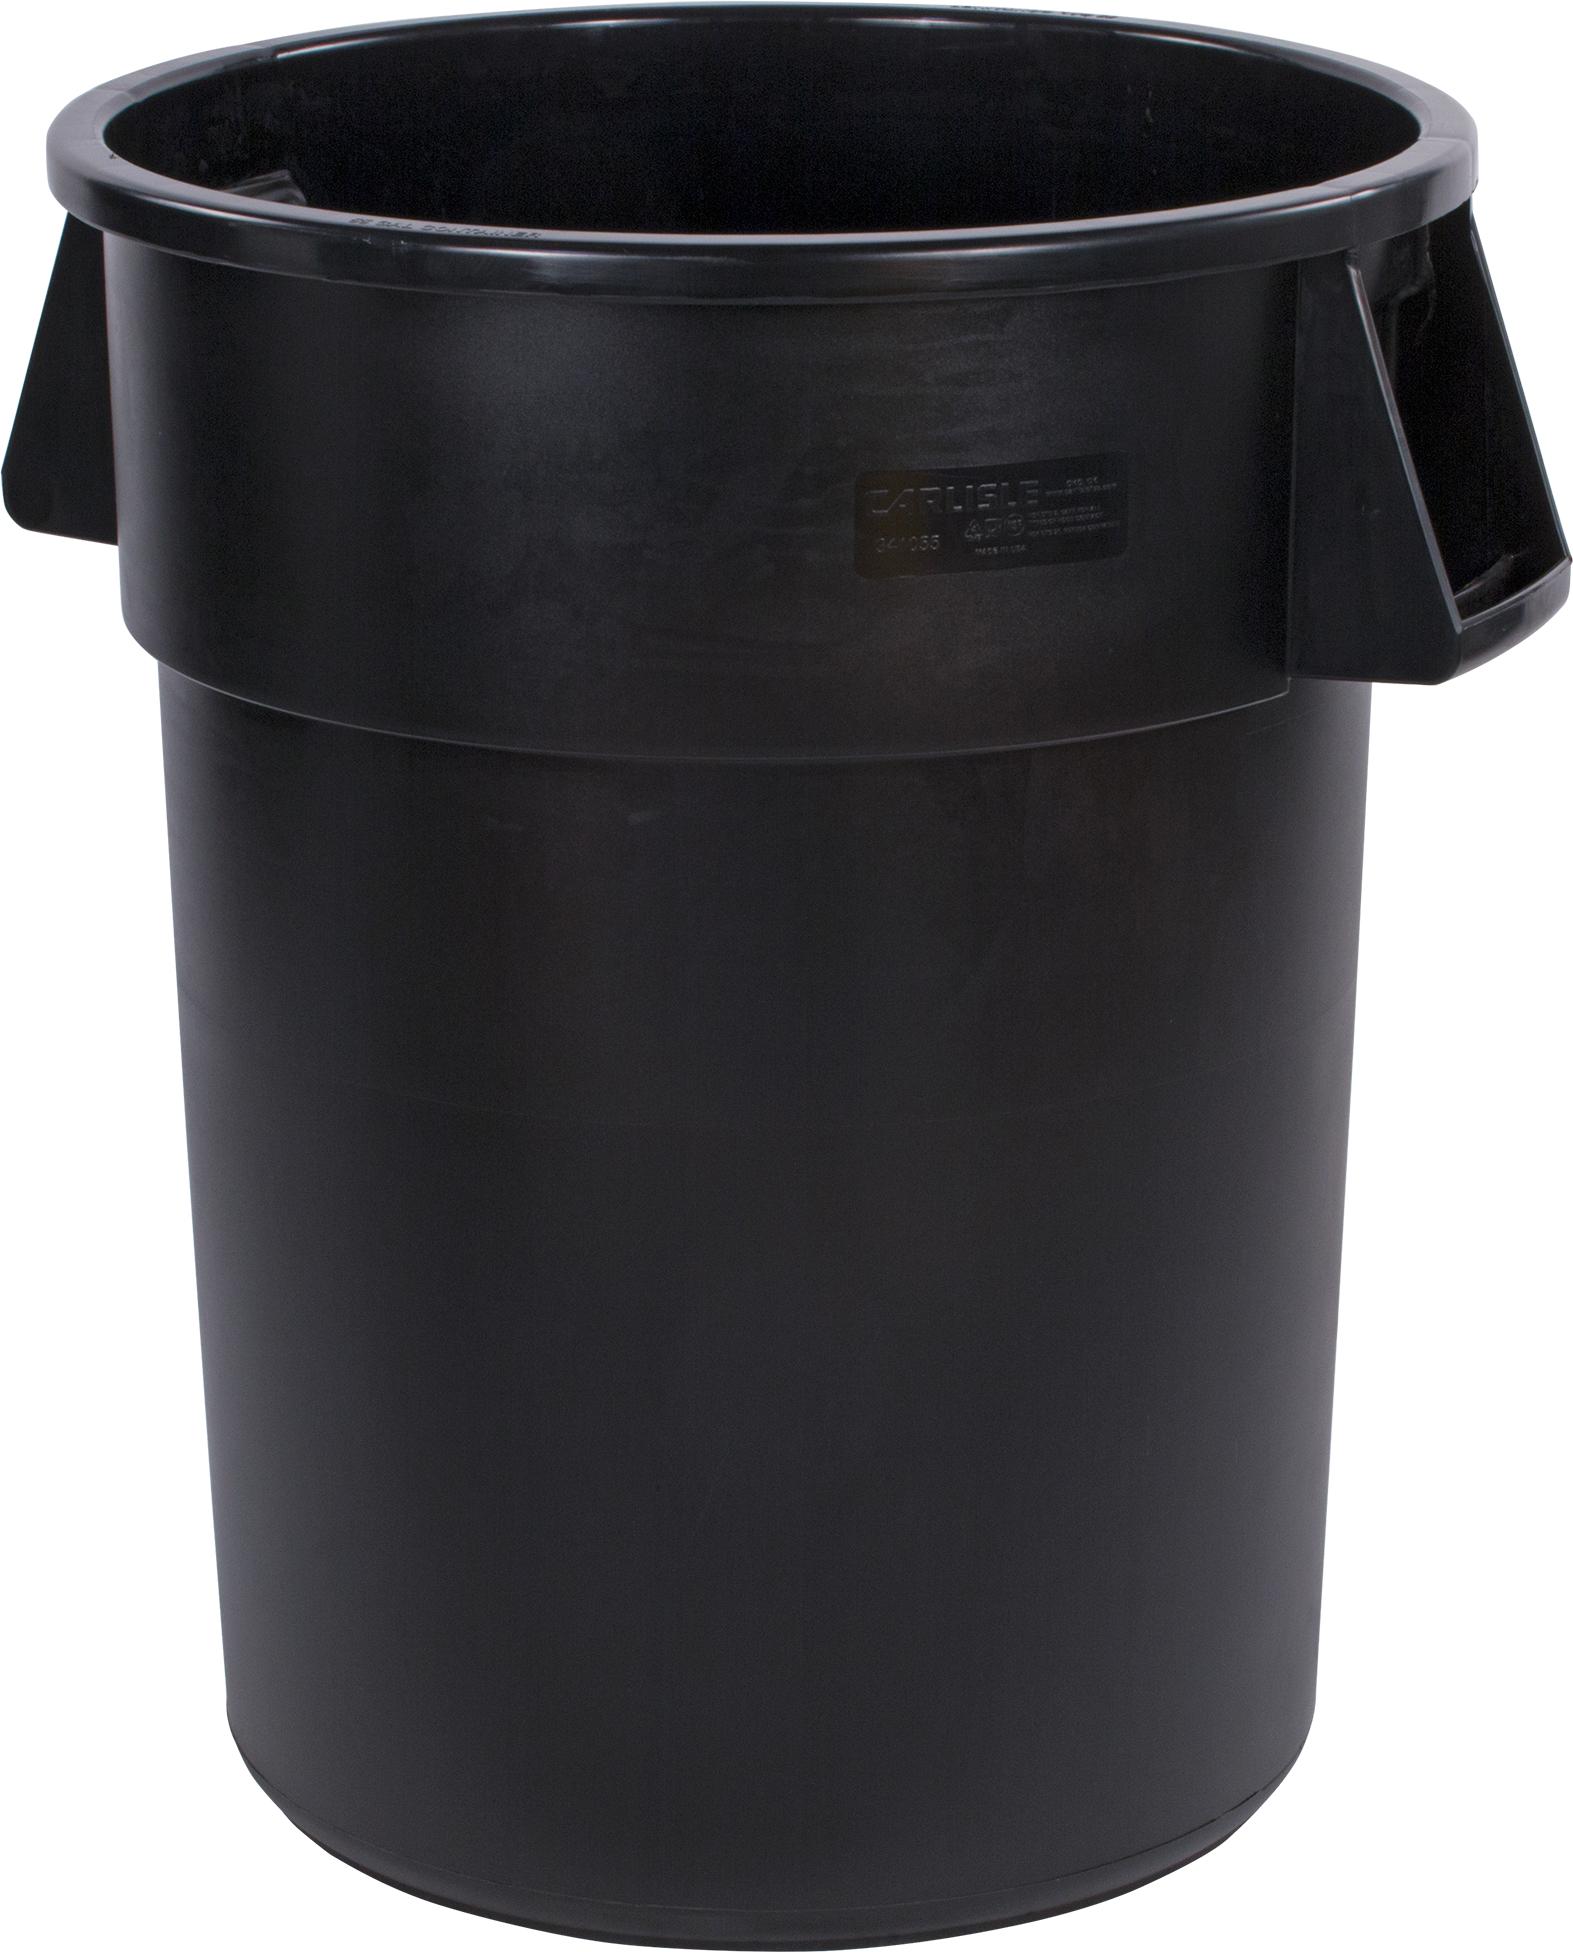 Bronco Round Waste Bin Trash Container 55 Gallon - Black